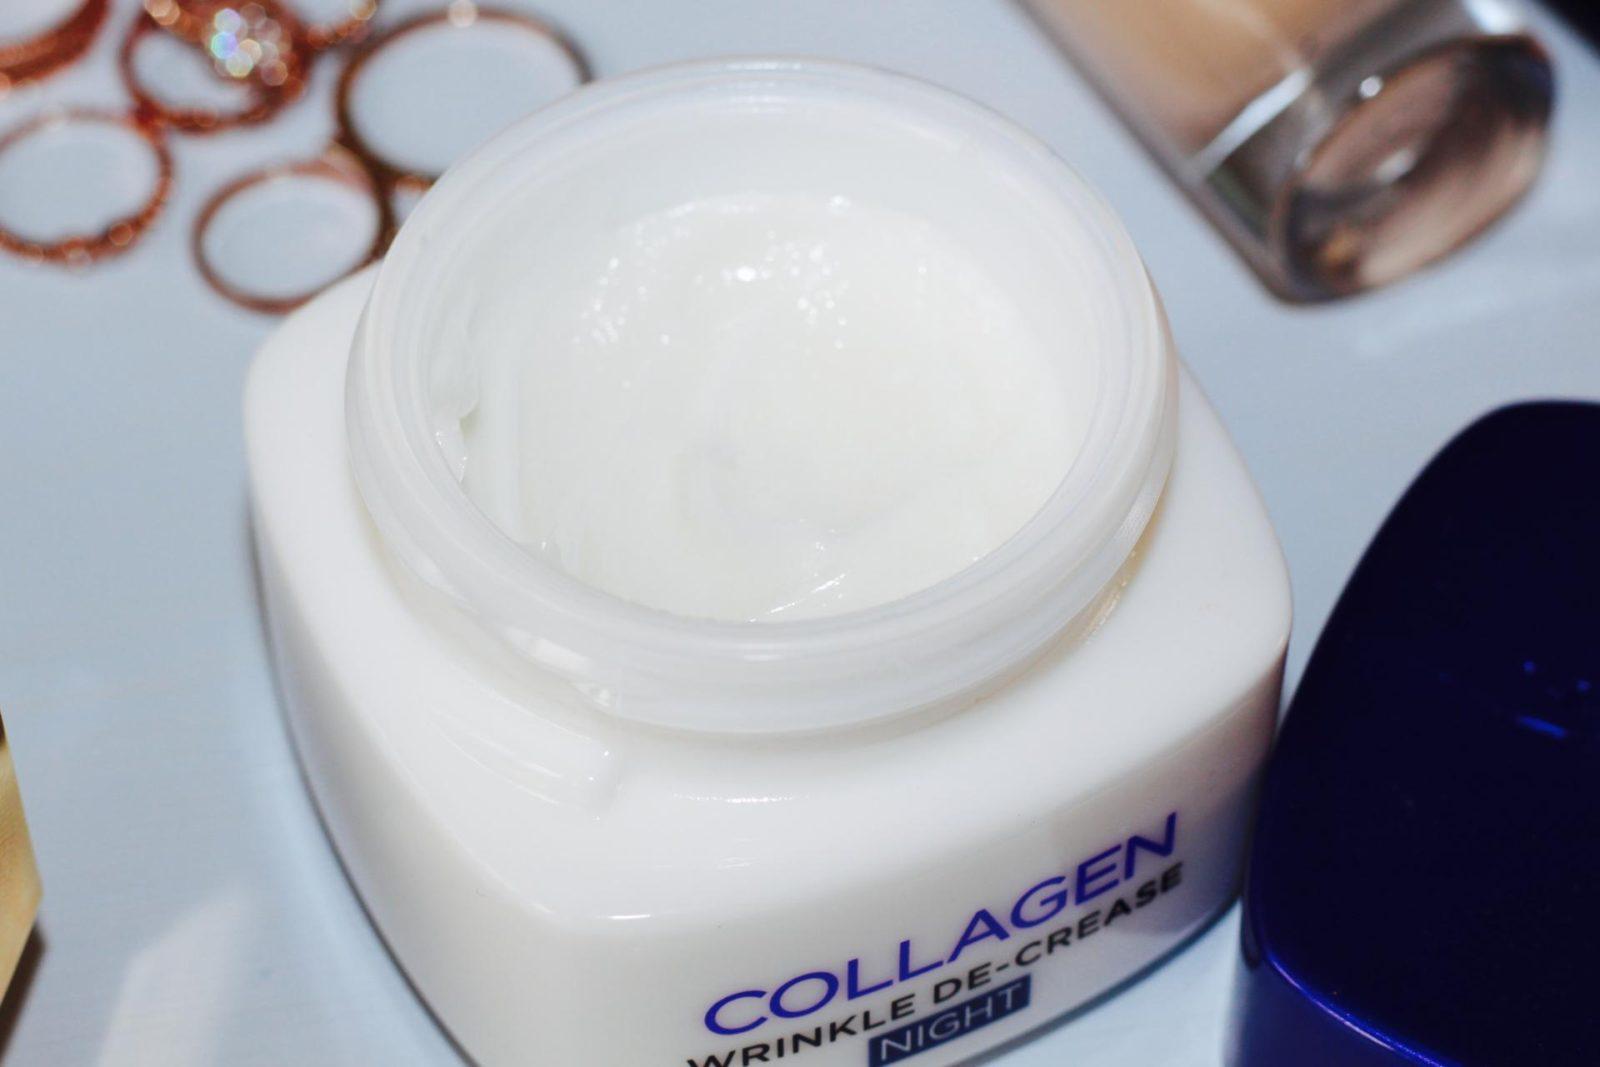 L'Oreal Collagen Wrinkle De-Crease